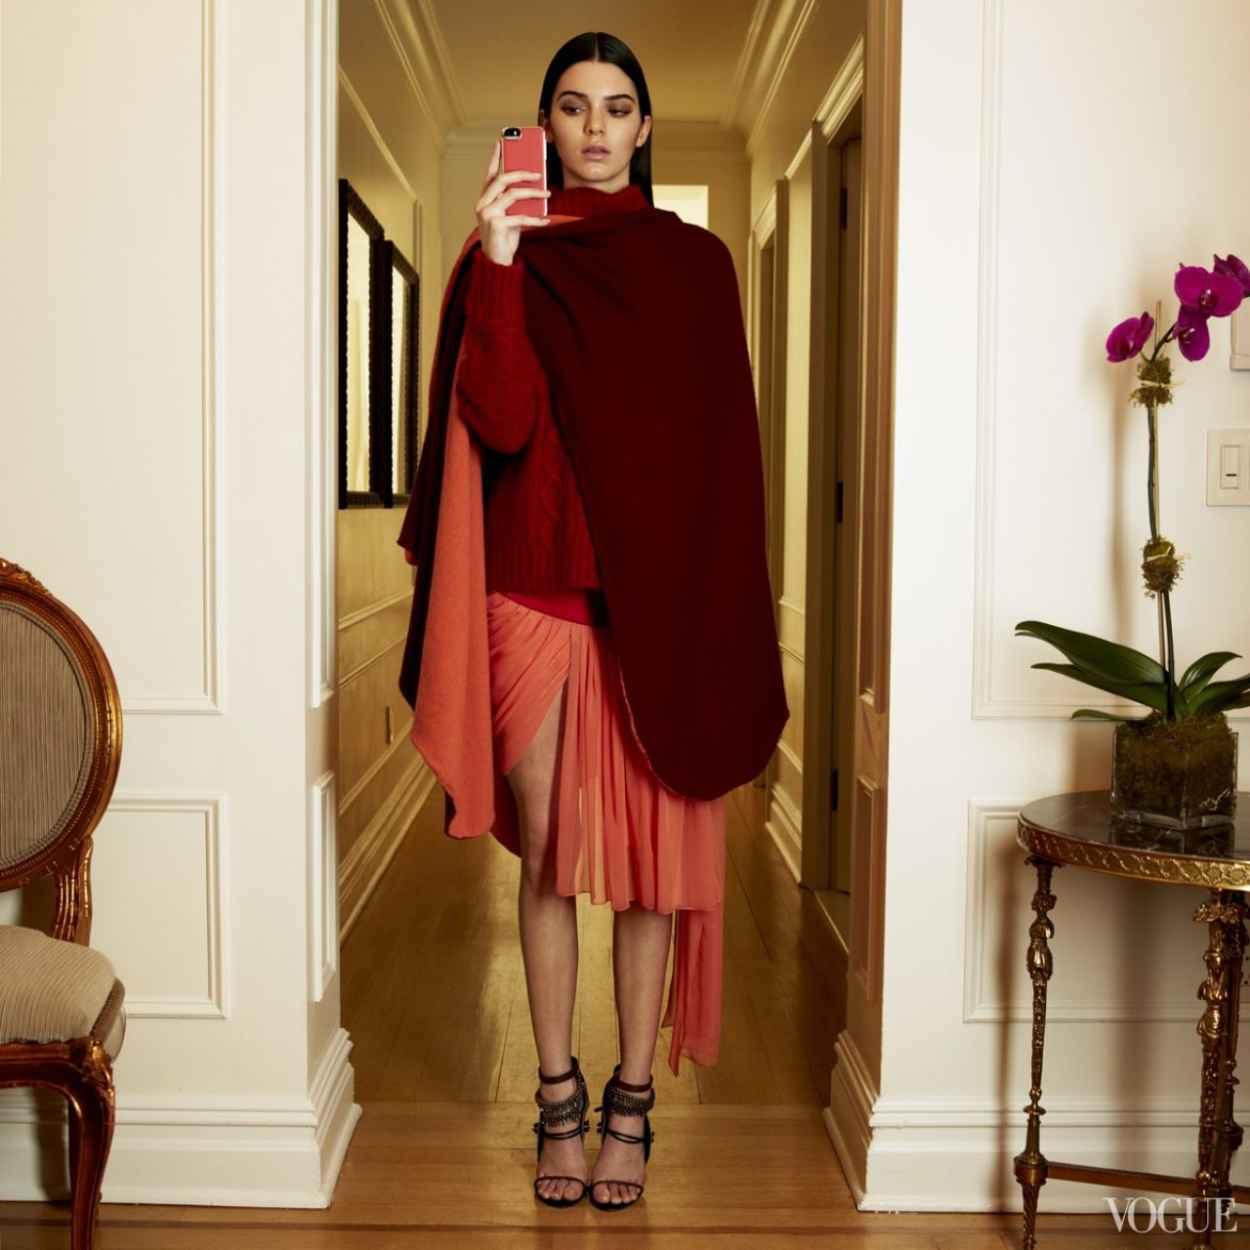 Kendall Jenner Fashion Week Instagram Shoot for VOGUE Magazine-1